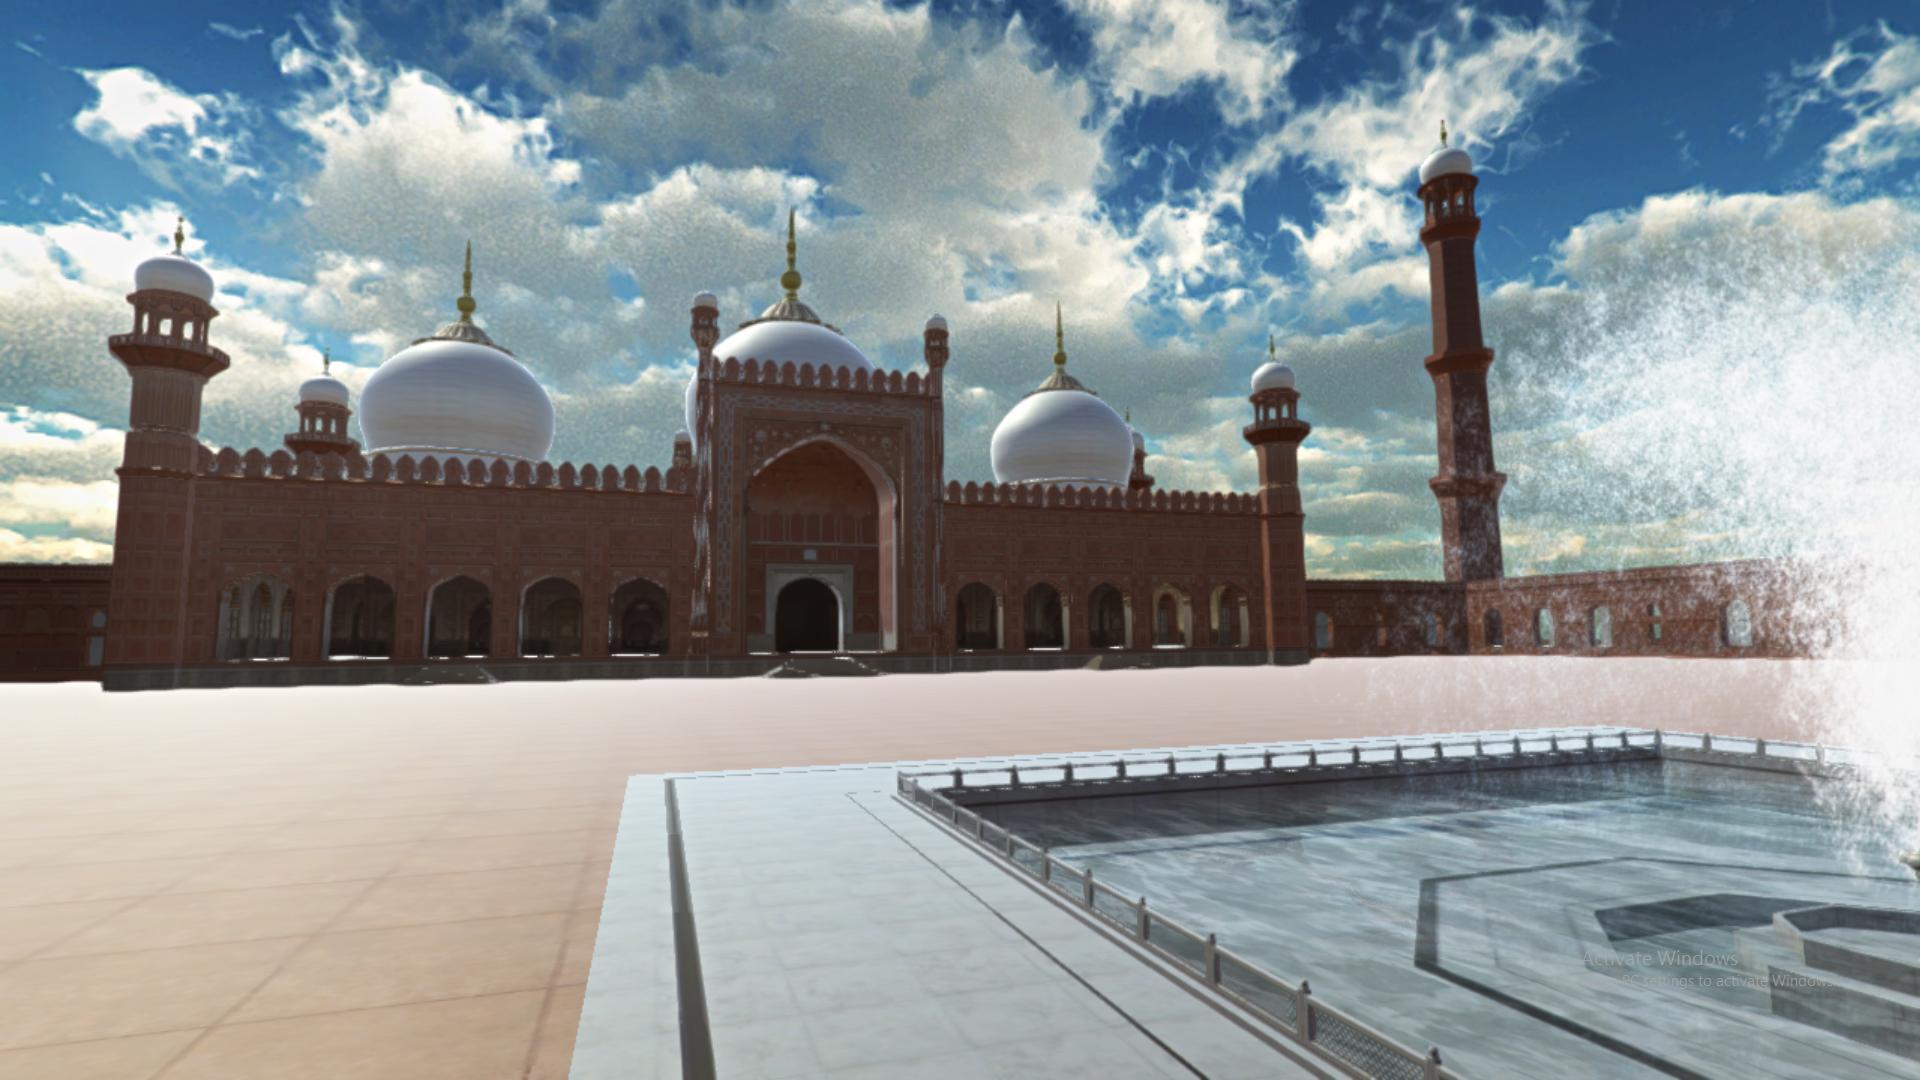 Badshahi Masjid Pakistan 3D for Android - APK Download